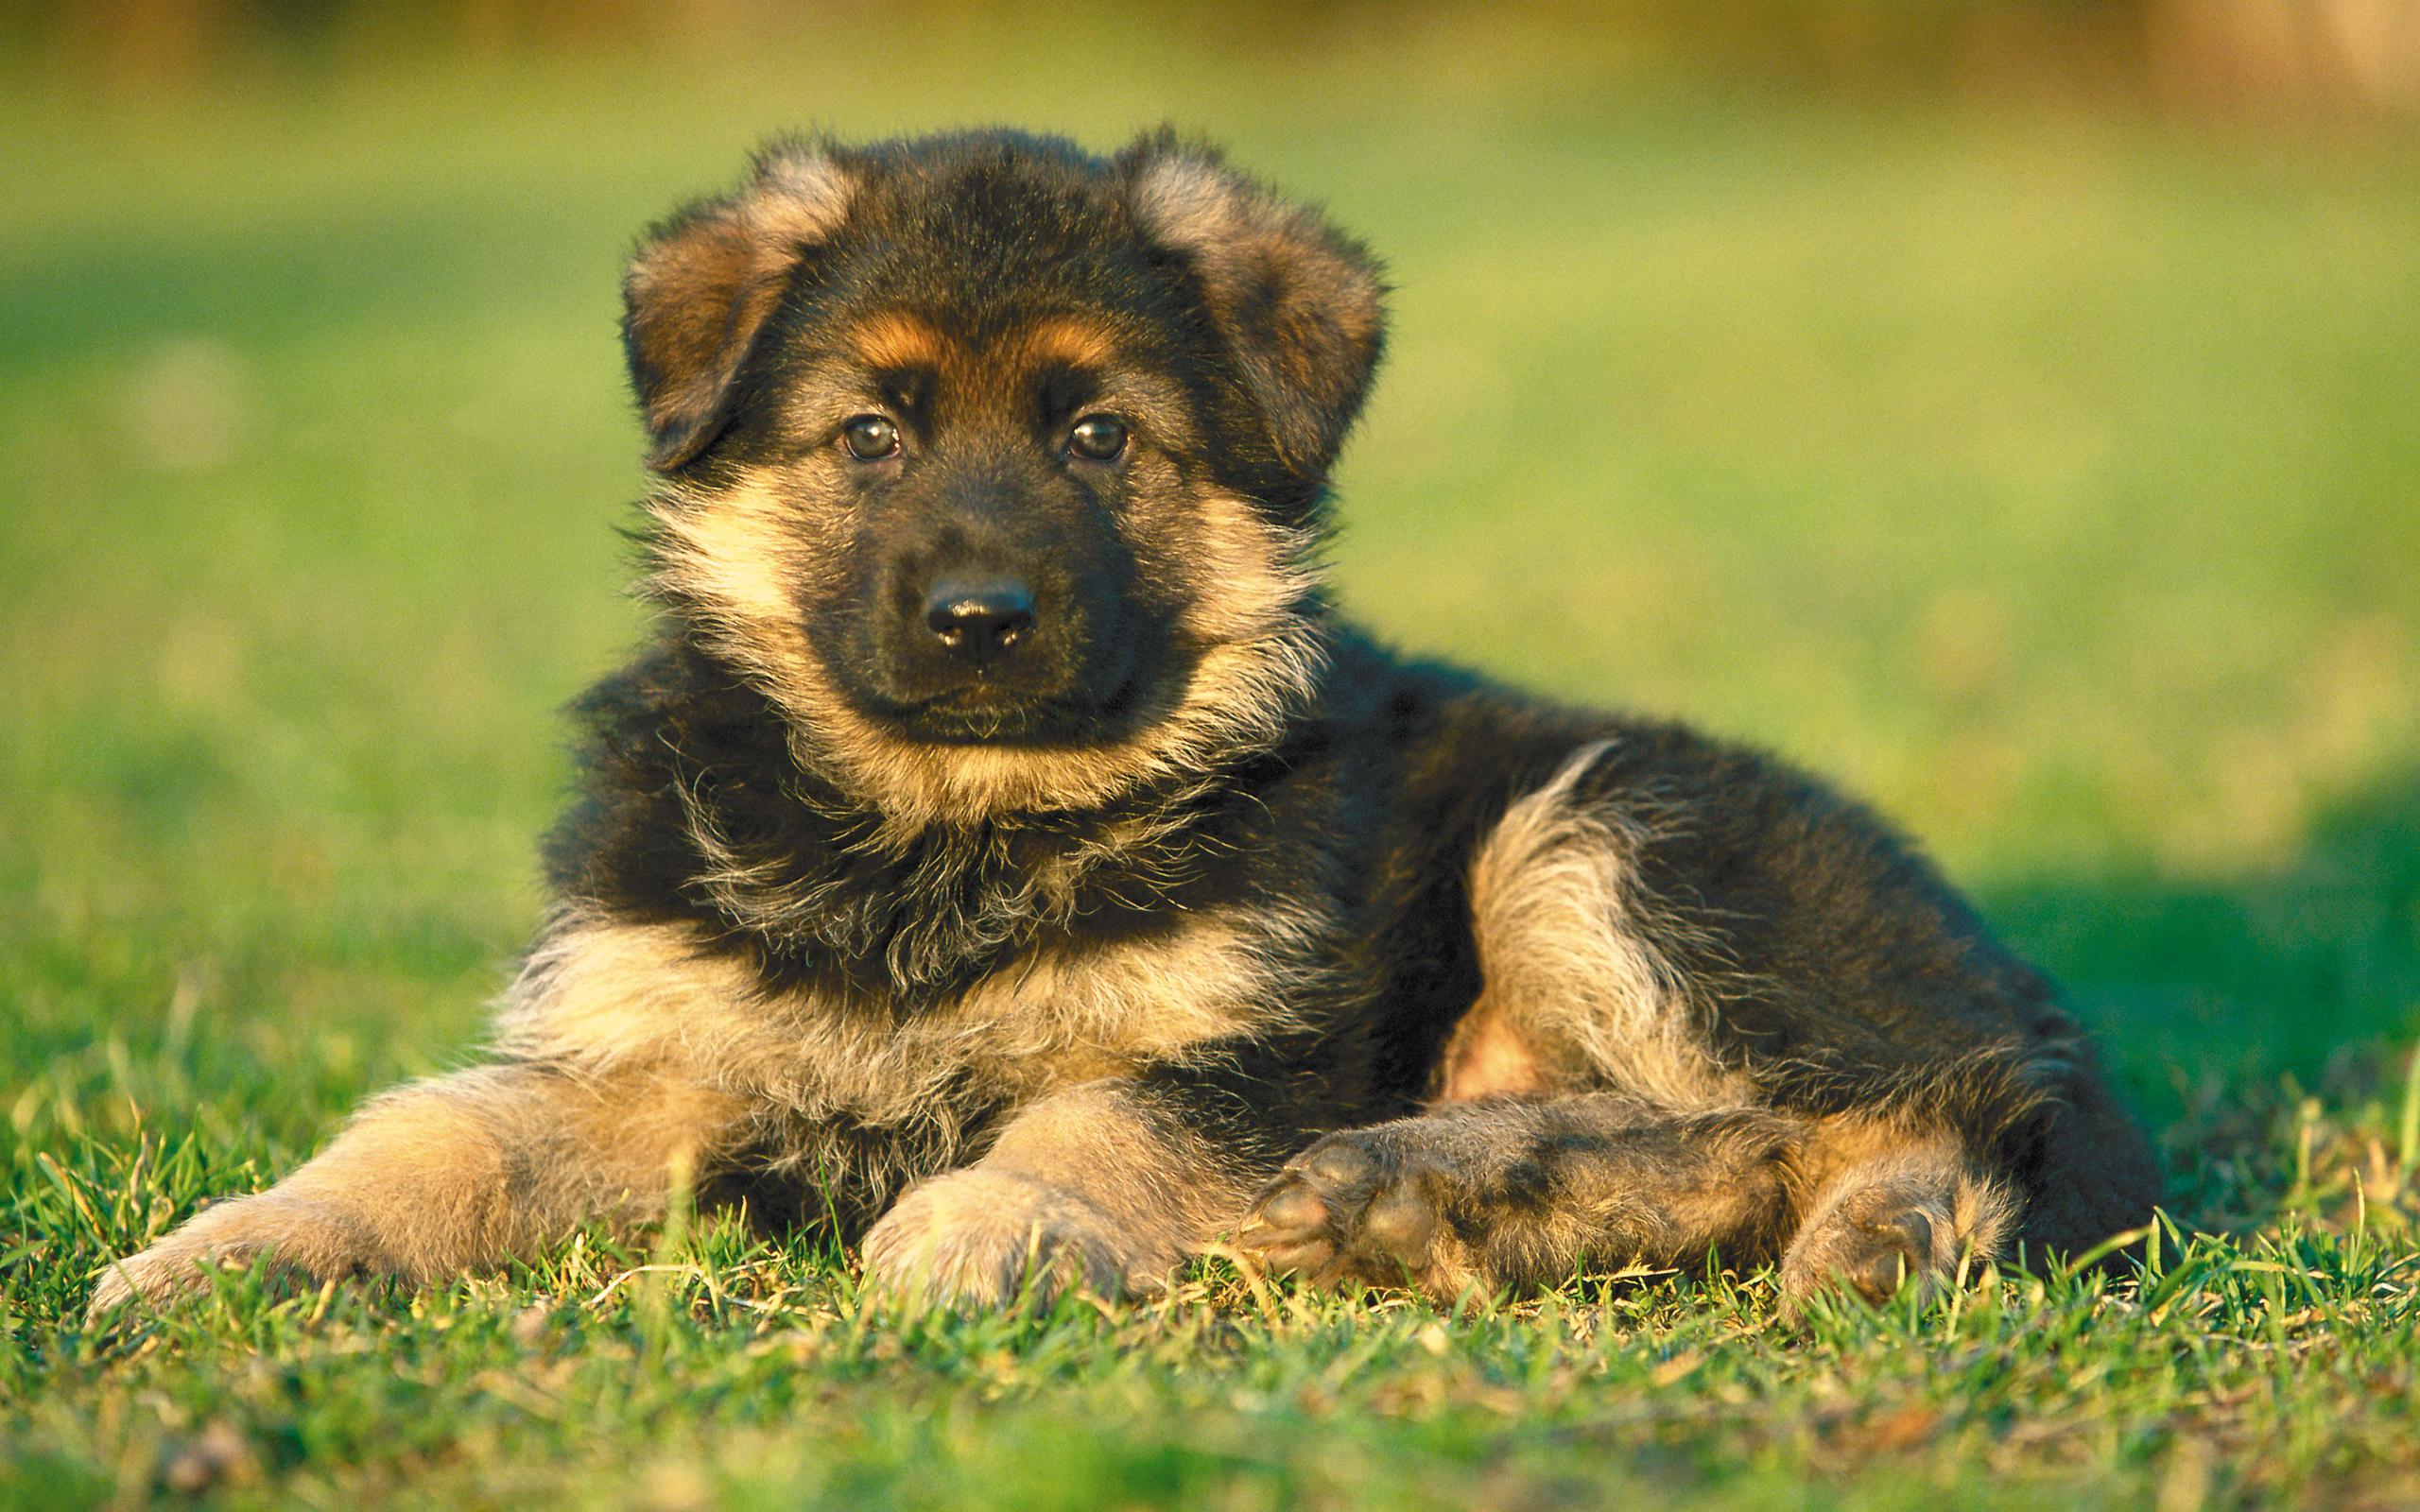 картинки собак овчарок немецких щенков фото, оно